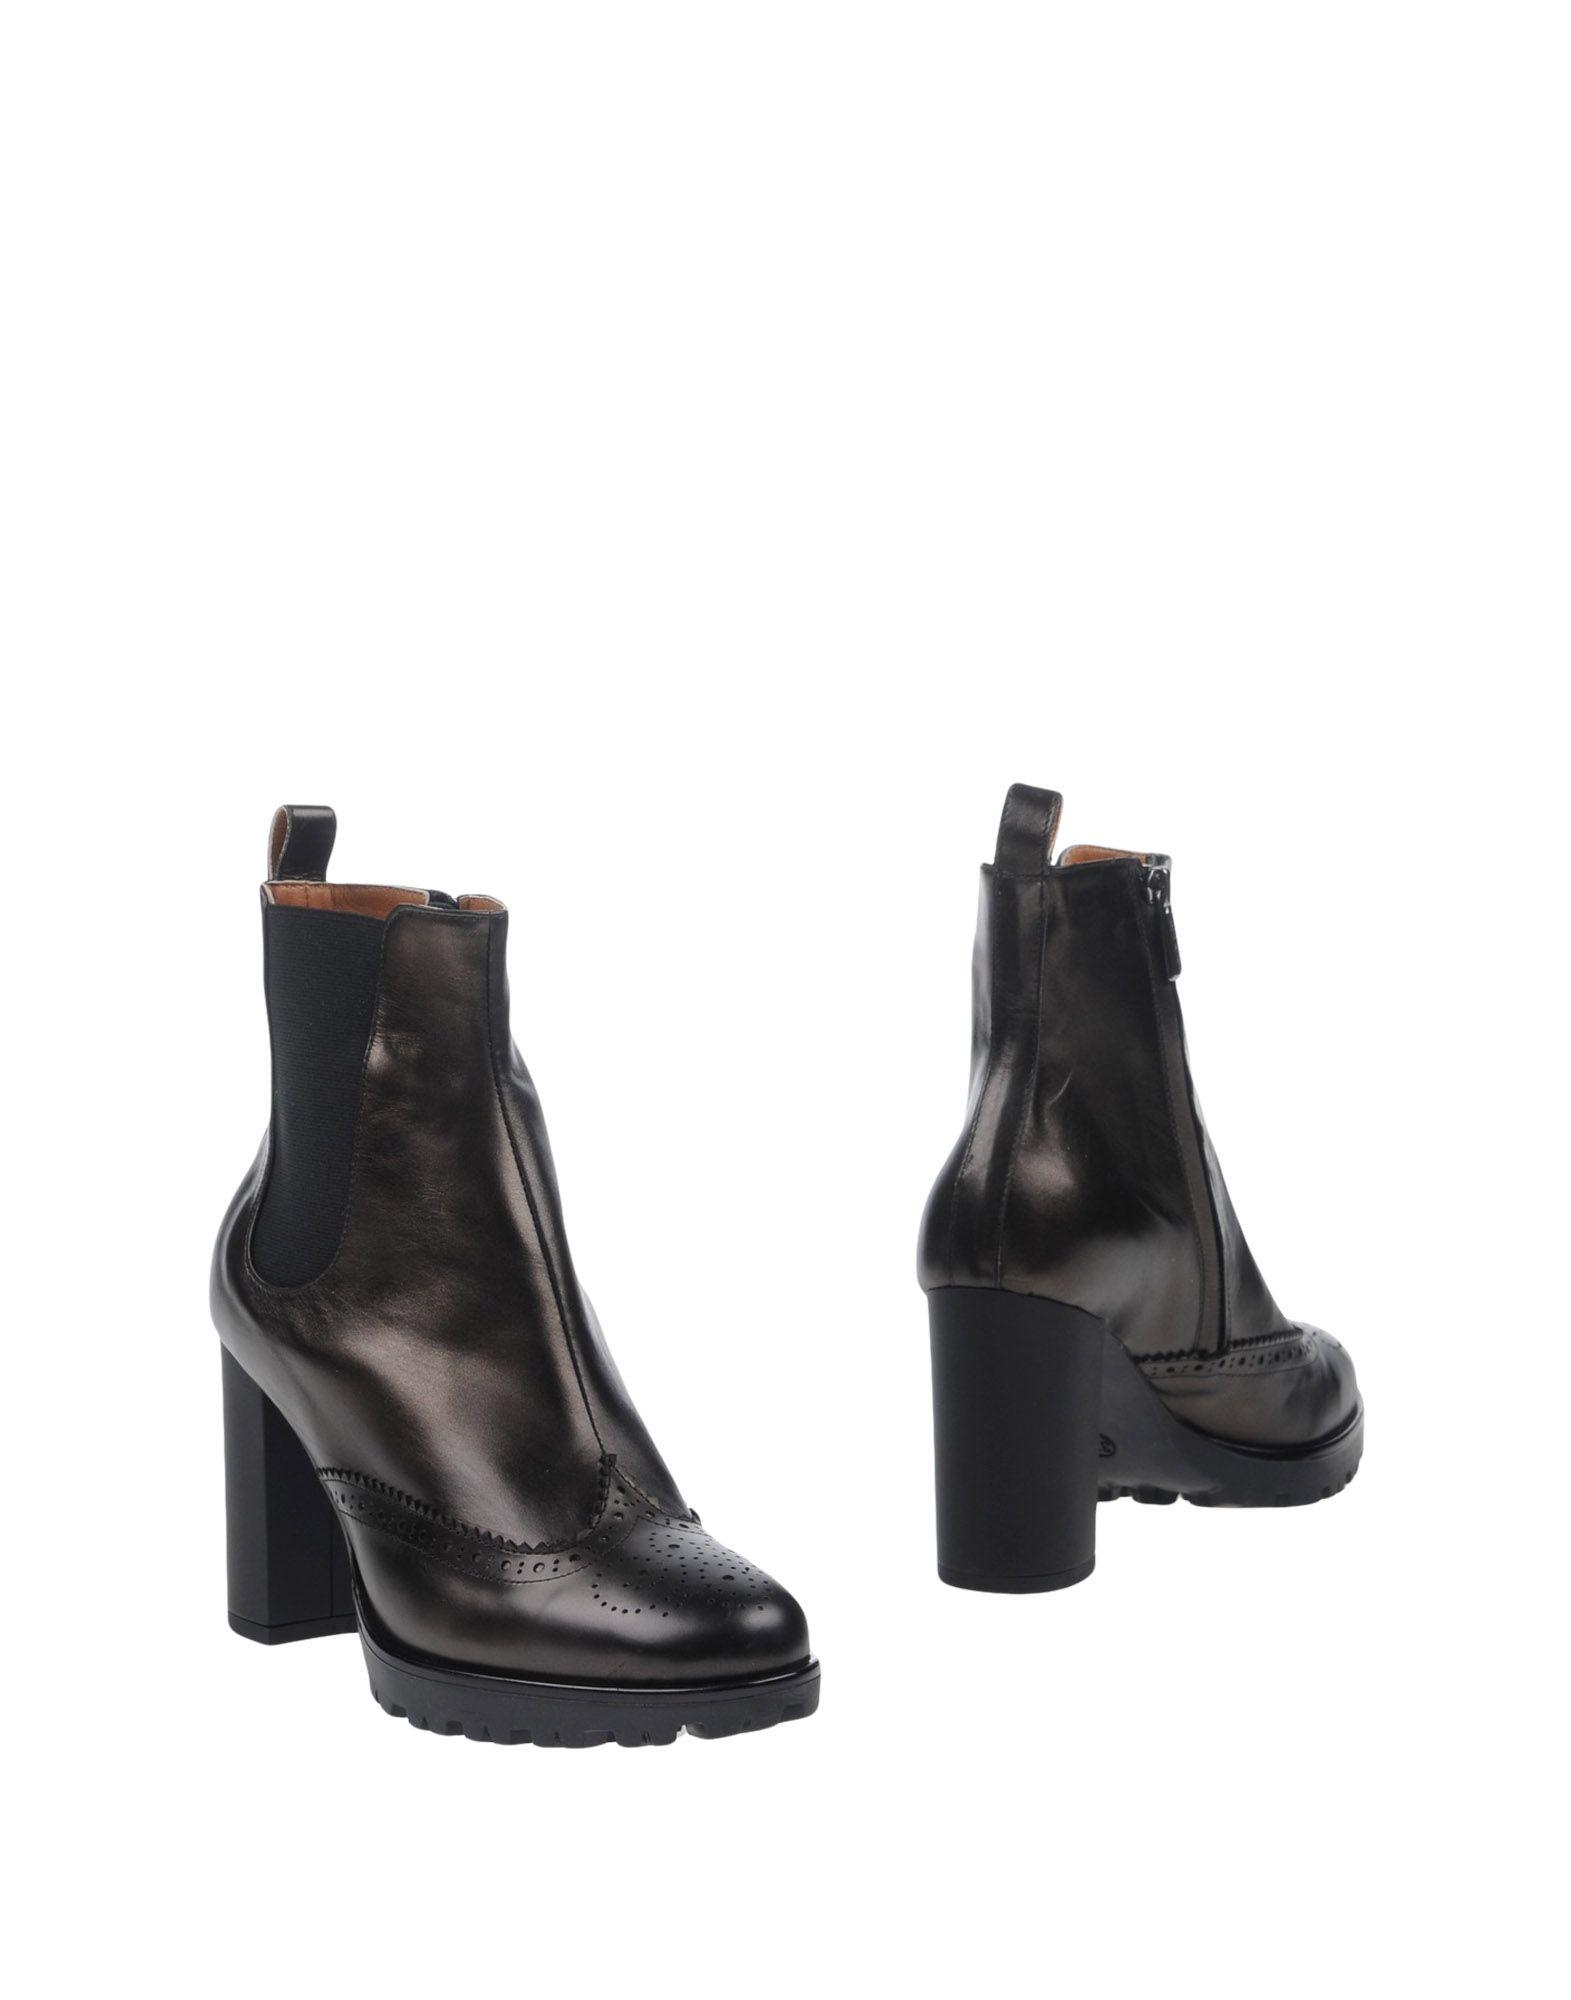 Stilvolle Loretta billige Schuhe Loretta Stilvolle Pettinari Chelsea Boots Damen  11254208GP 880f46